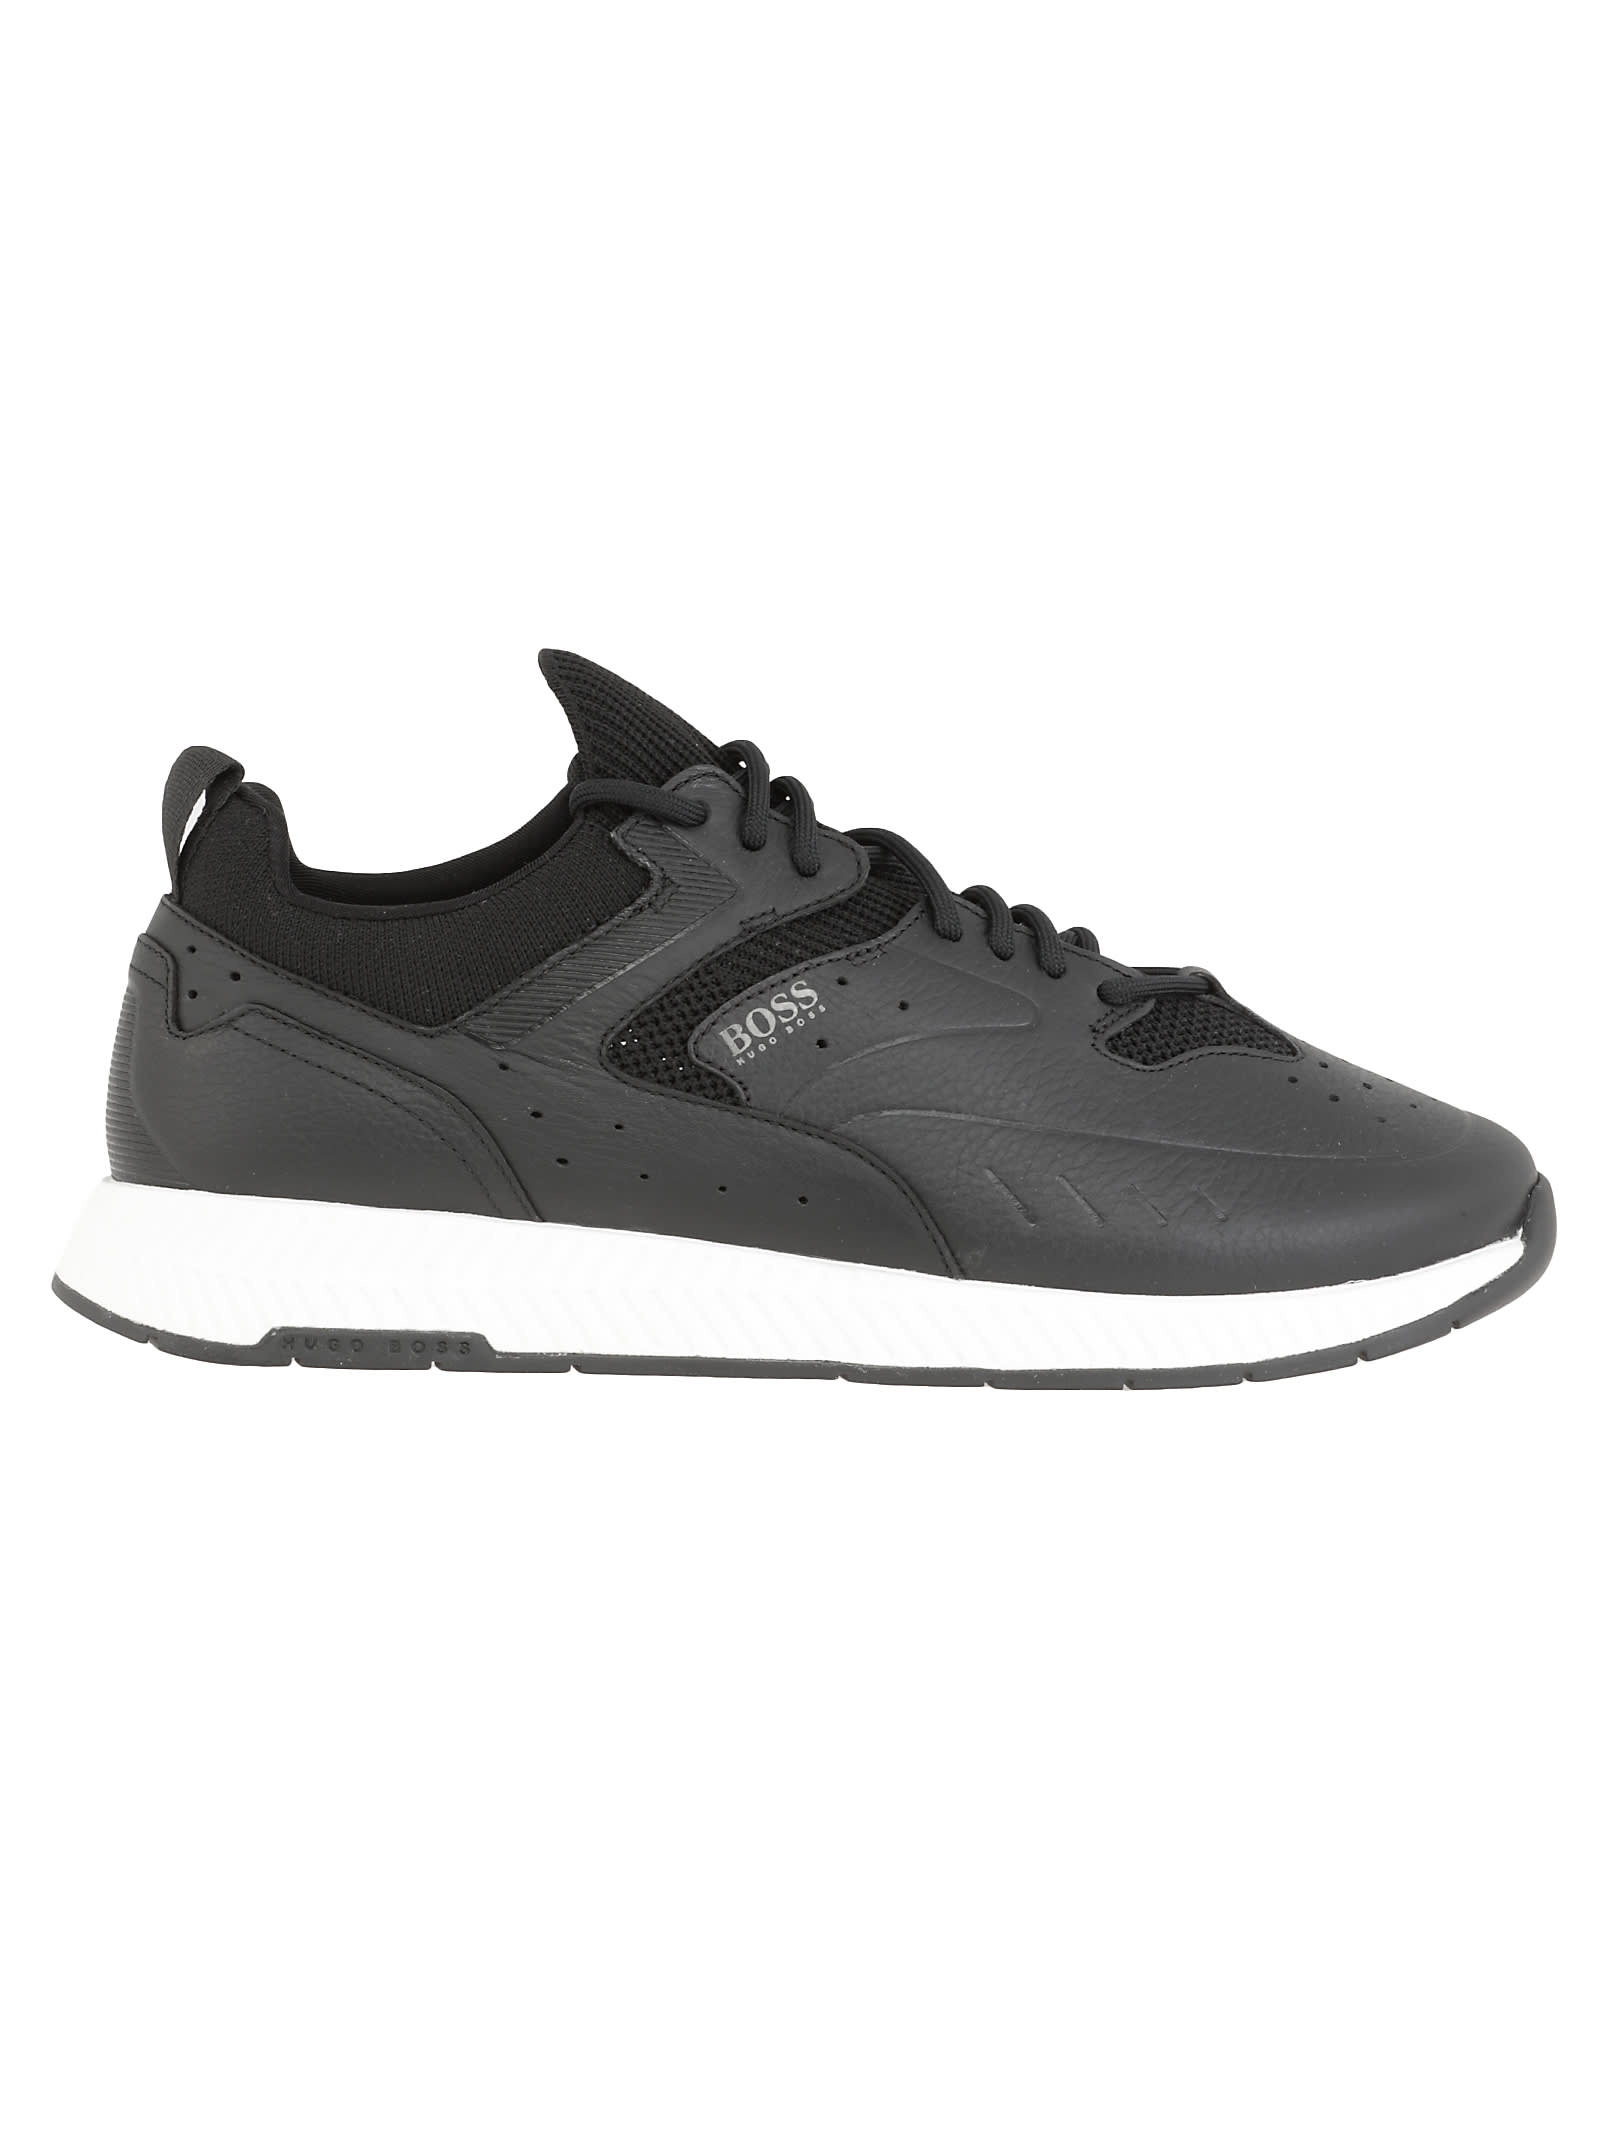 Hugo Boss Titanium Runn Kntb Sneaker